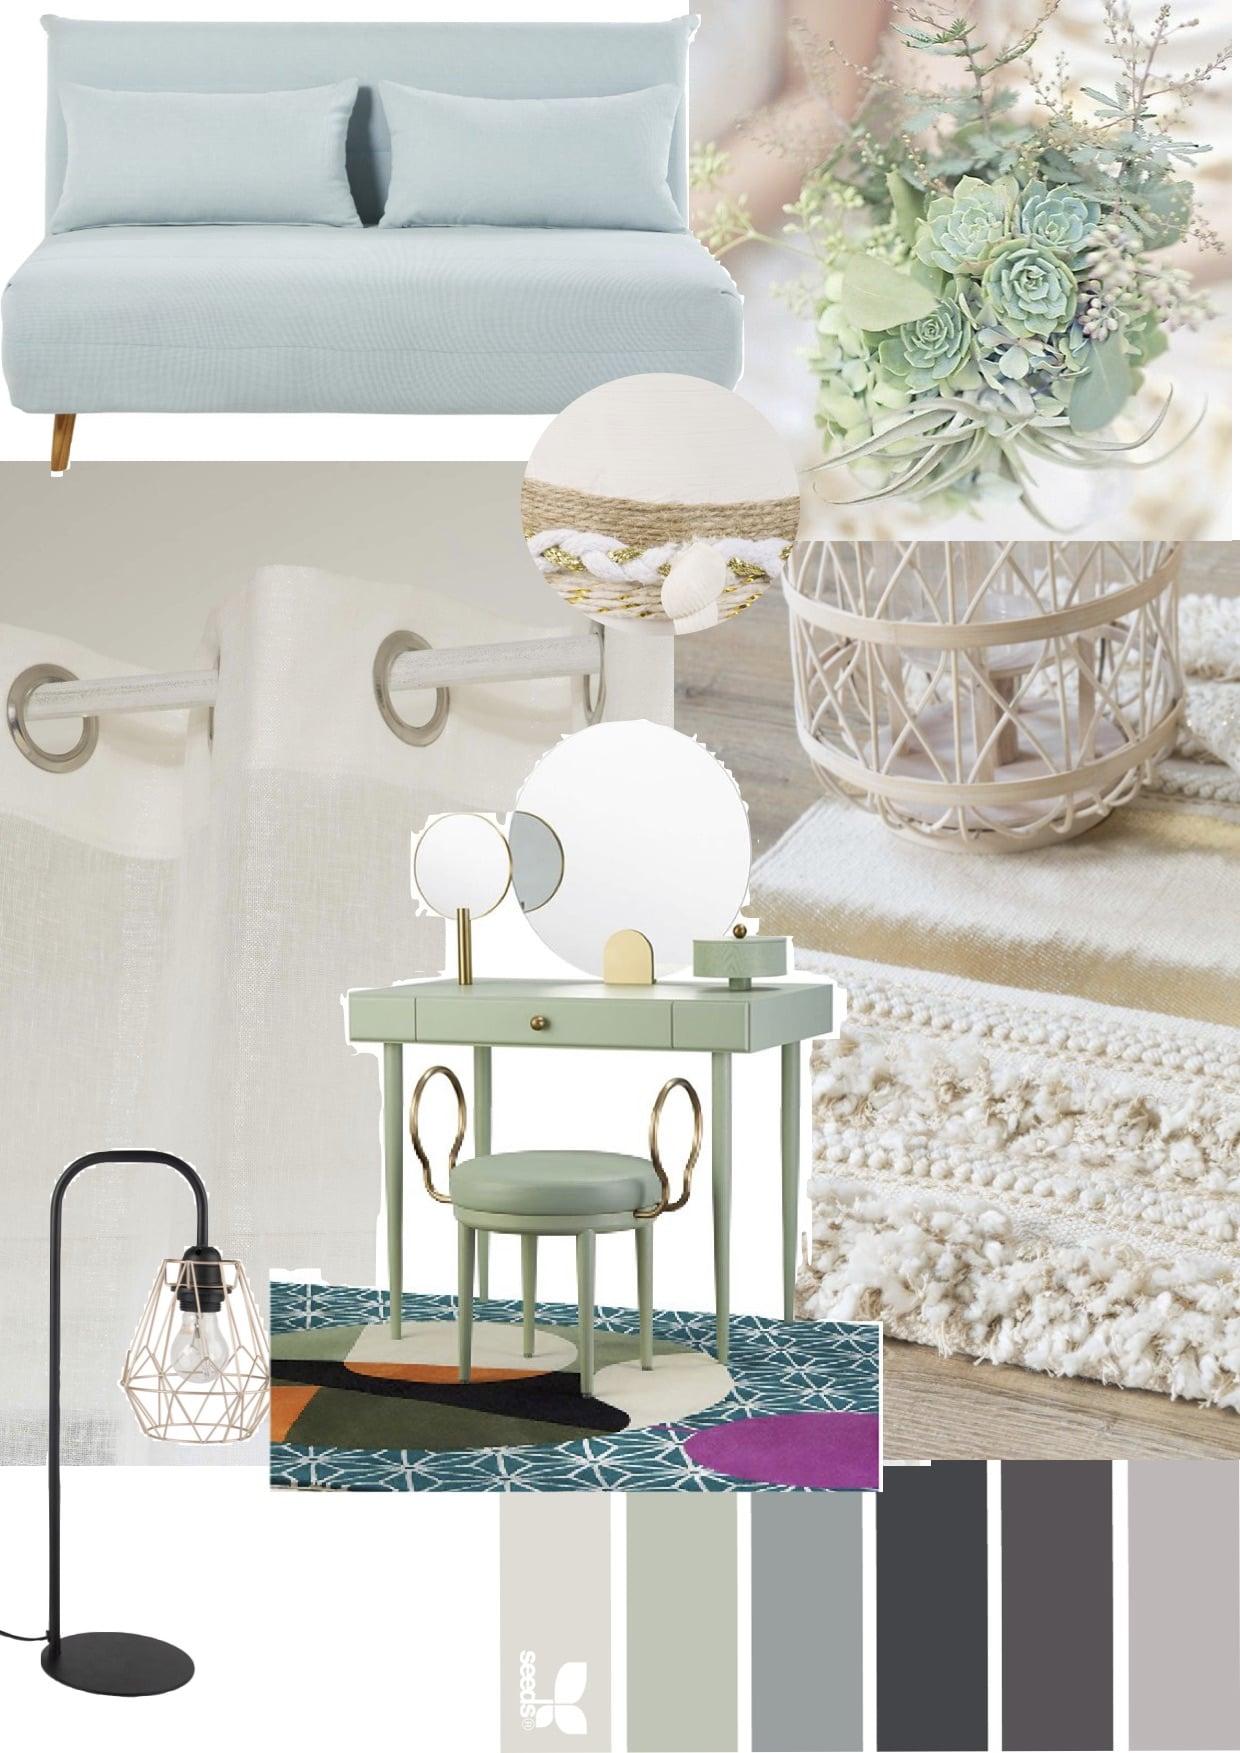 de l 39 inutilit d 39 un grand dressing ou comment. Black Bedroom Furniture Sets. Home Design Ideas